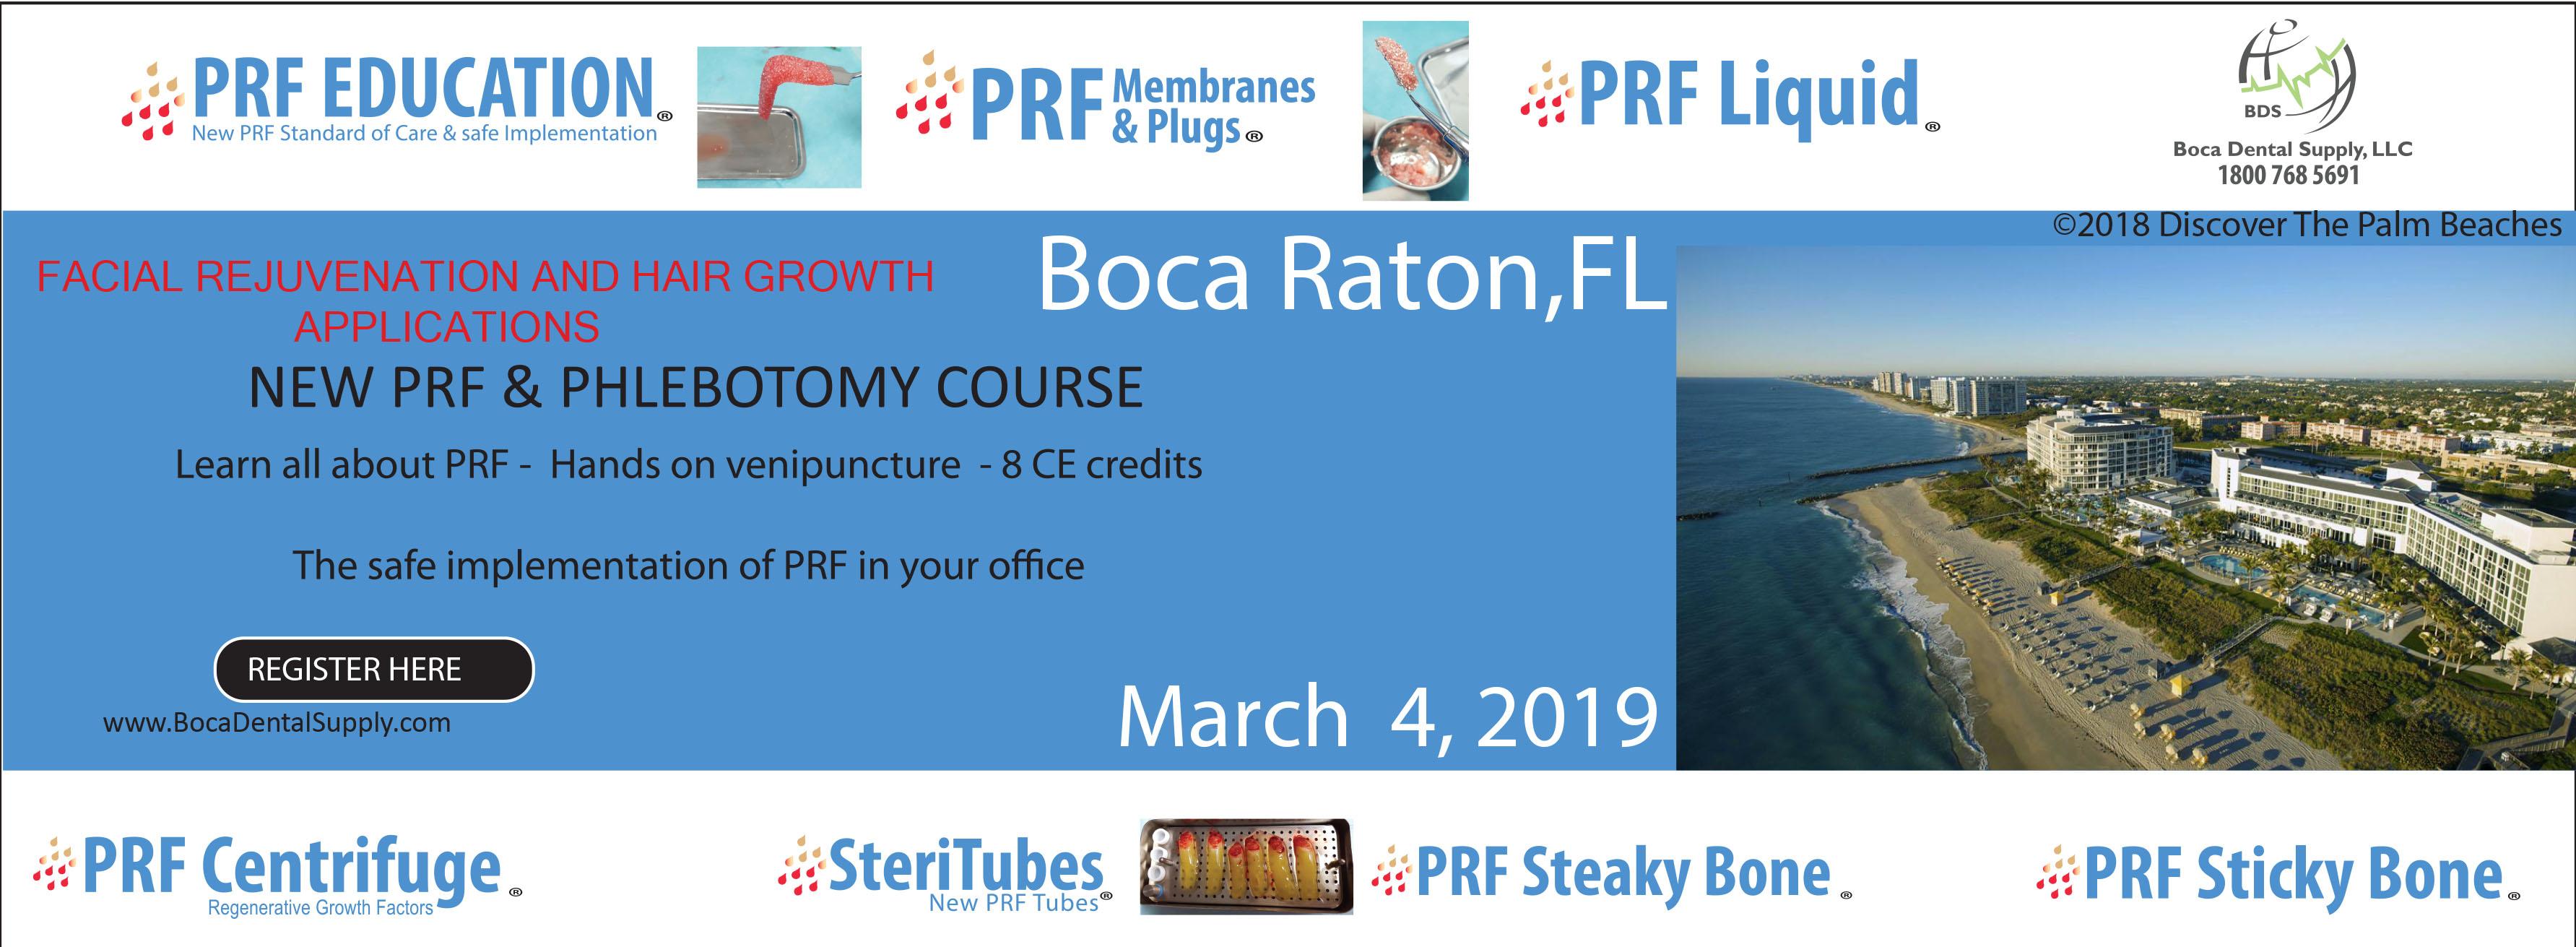 prf-course-boca-raton-facial-rejuvenation-2019.jpg